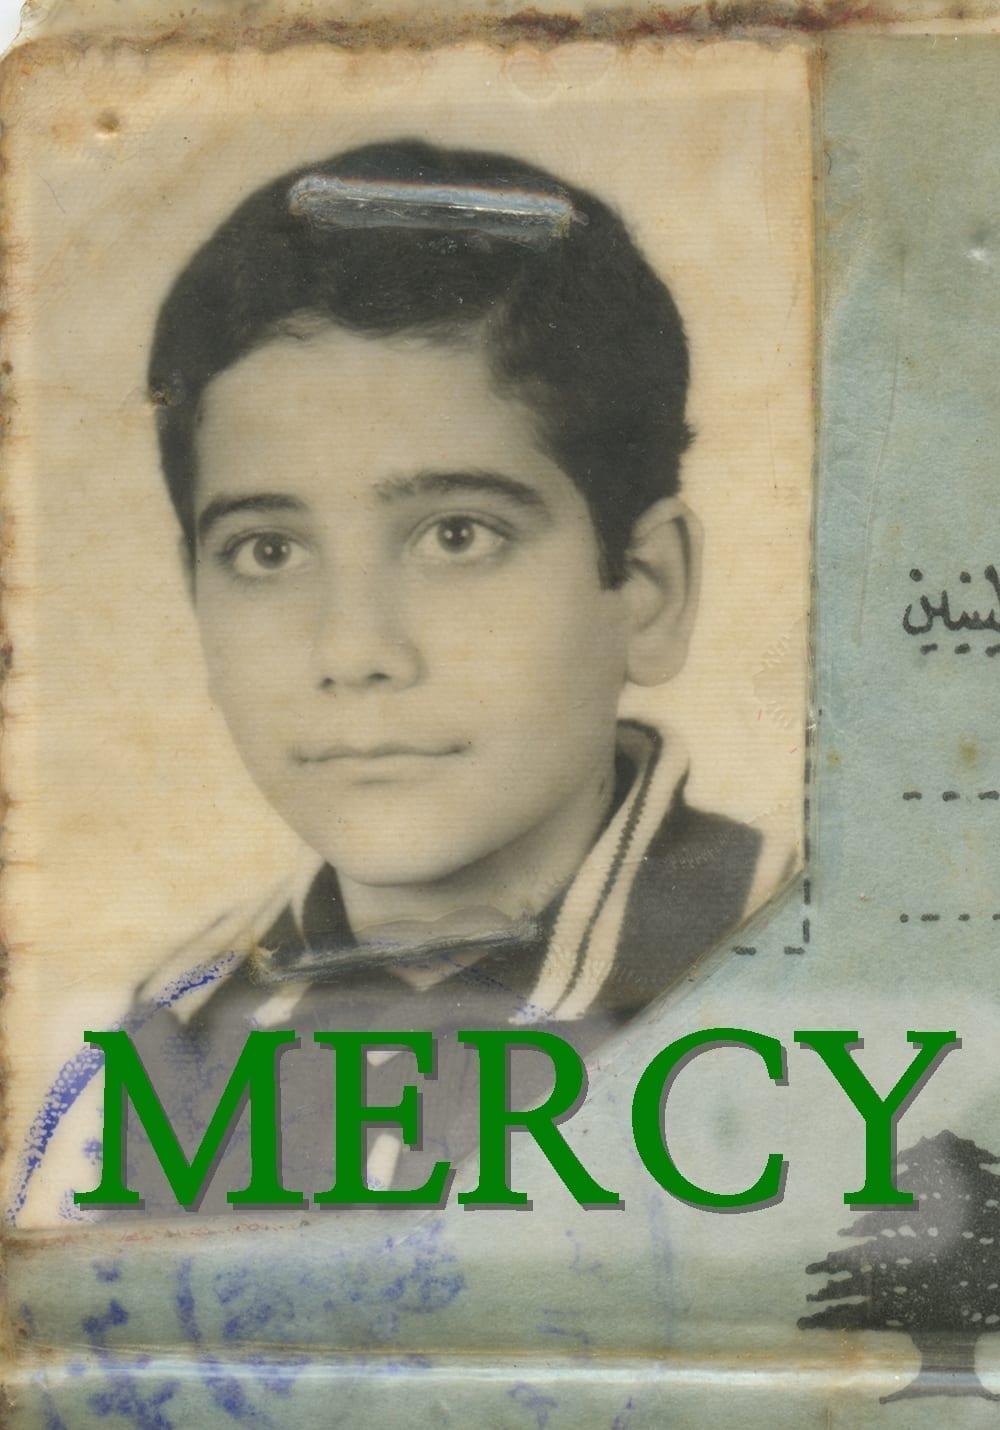 Cover image for EthicsDaily.com's short documentary Mercy